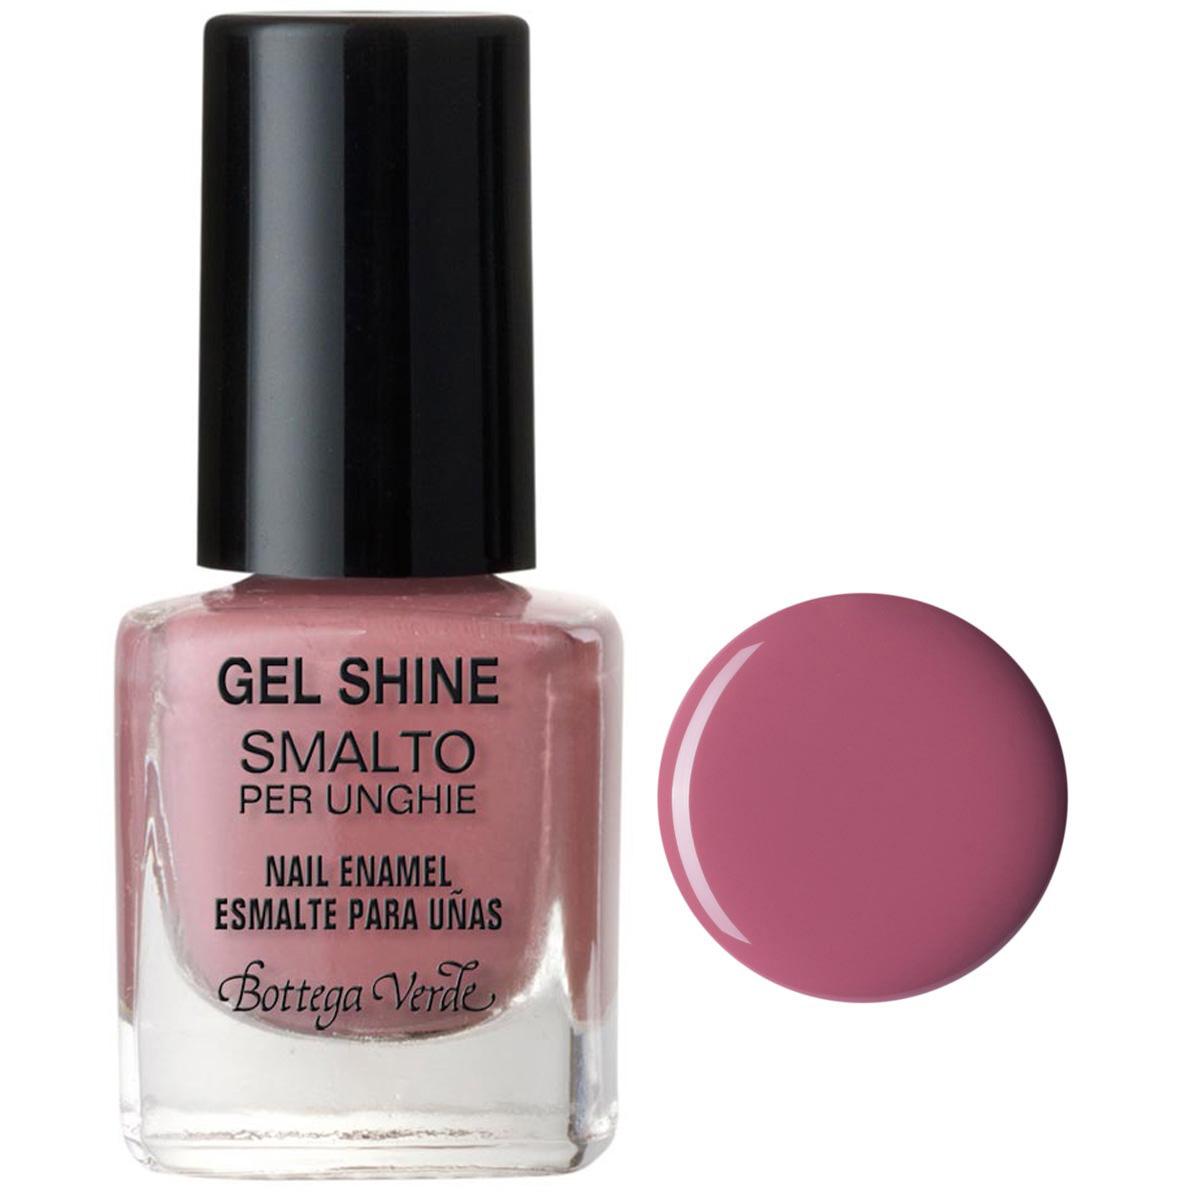 Lac de unghii, roz invechit - Gel Shine, 5 ML